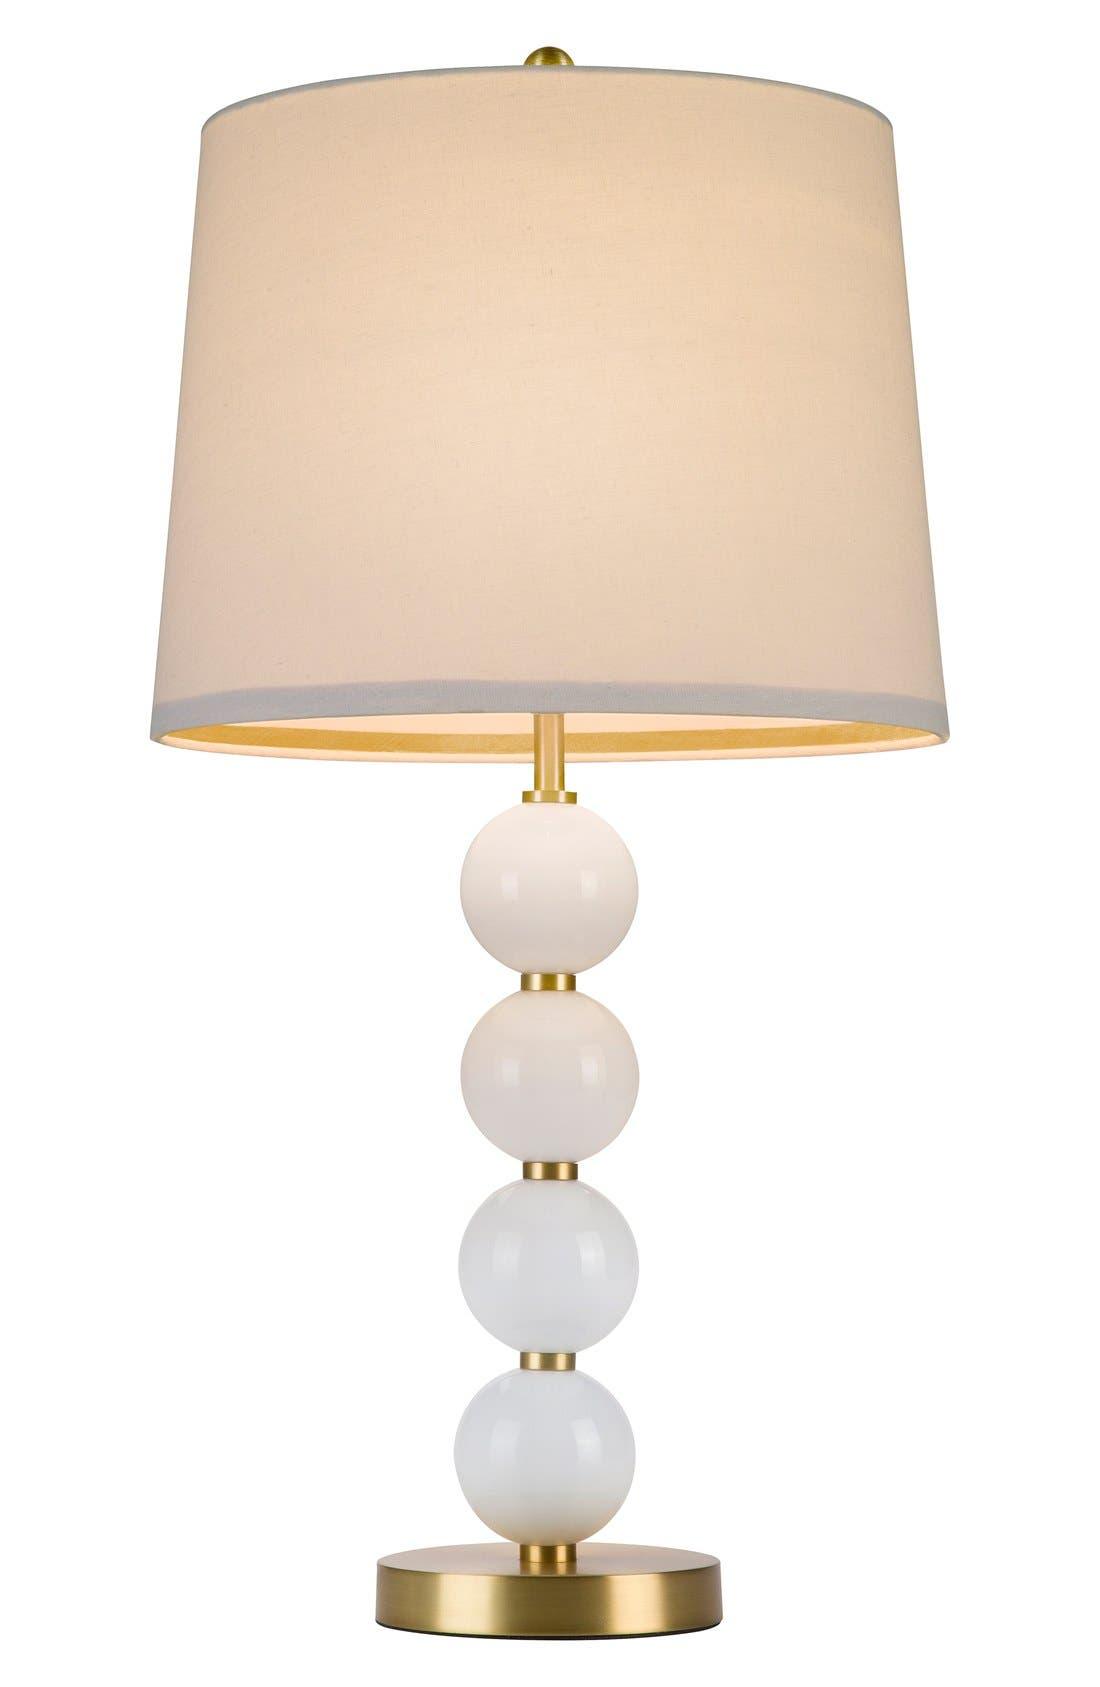 Stacked Ball Table Lamp,                             Main thumbnail 1, color,                             Pink